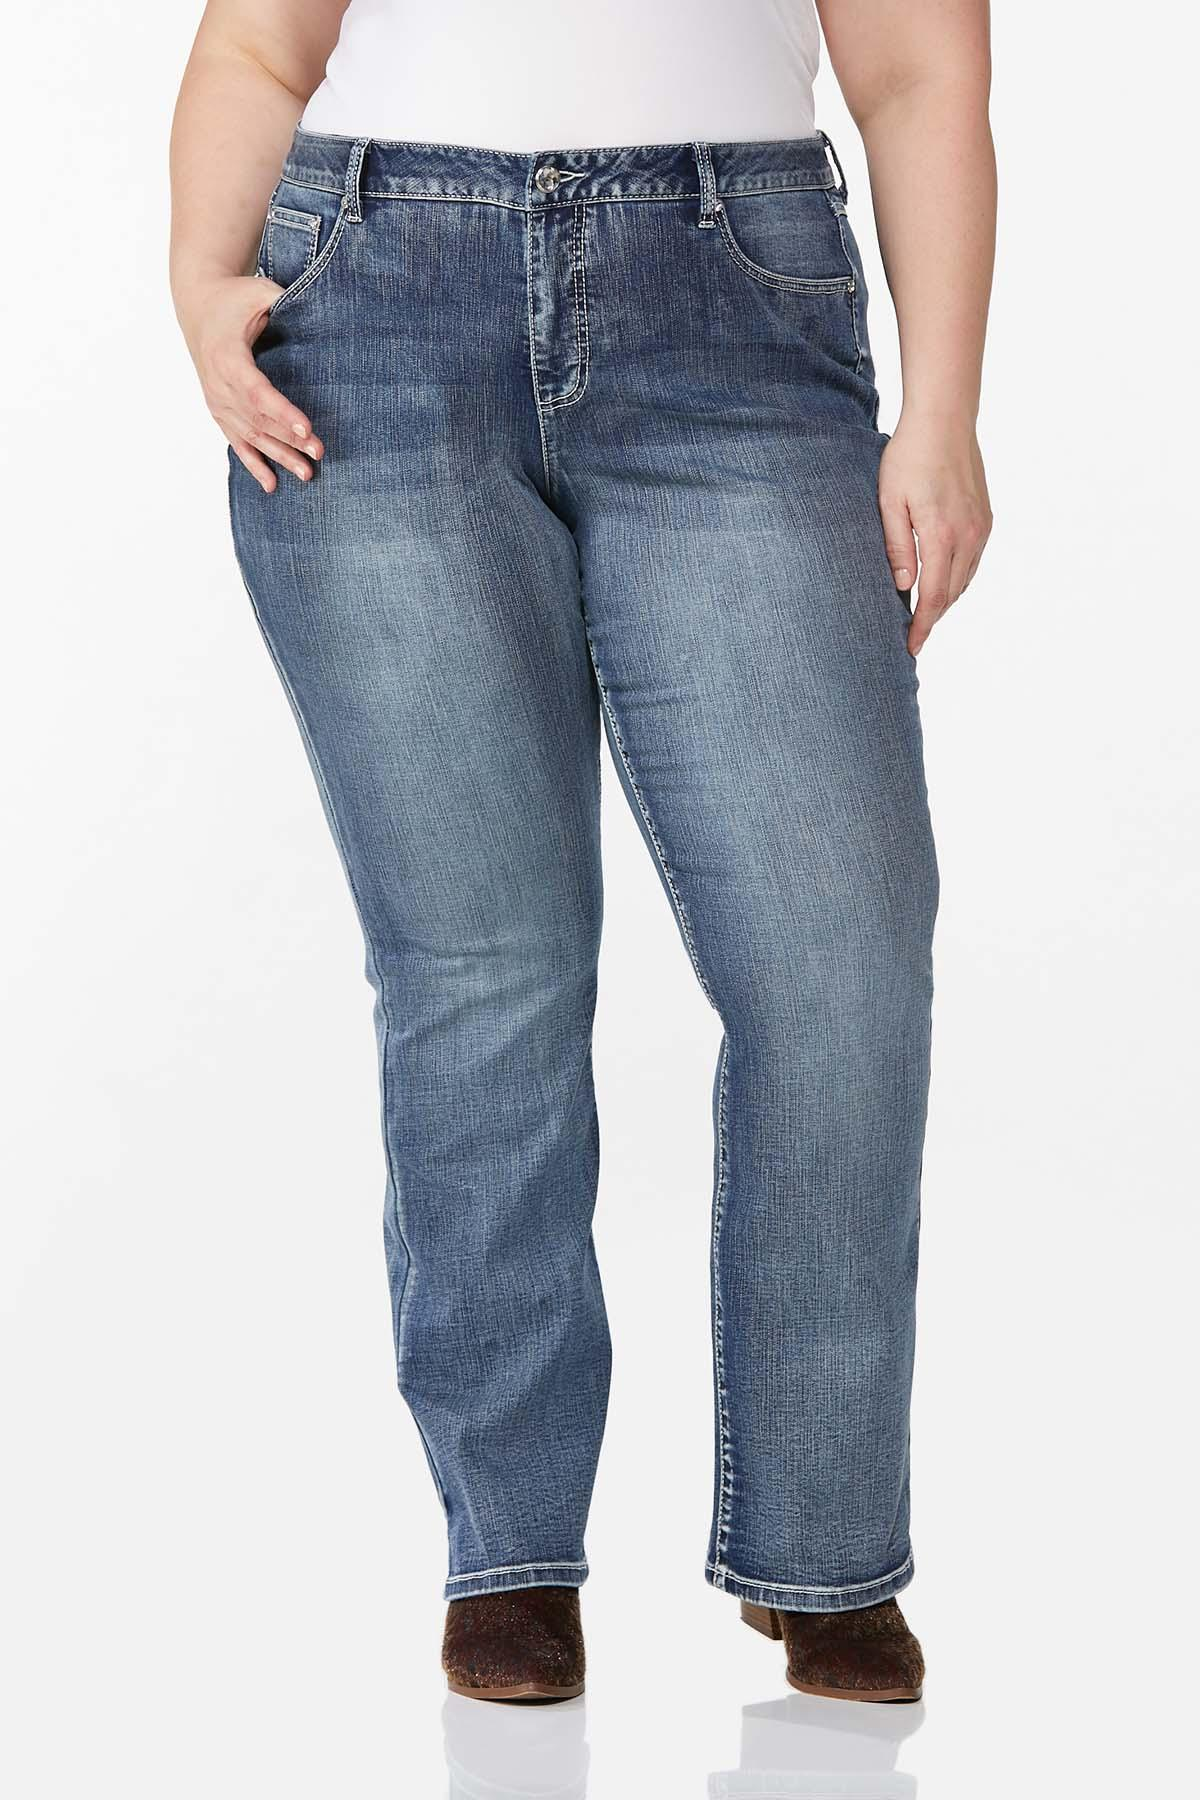 Plus Petite Stone Leopard Pocket Jeans (Item #44709702)